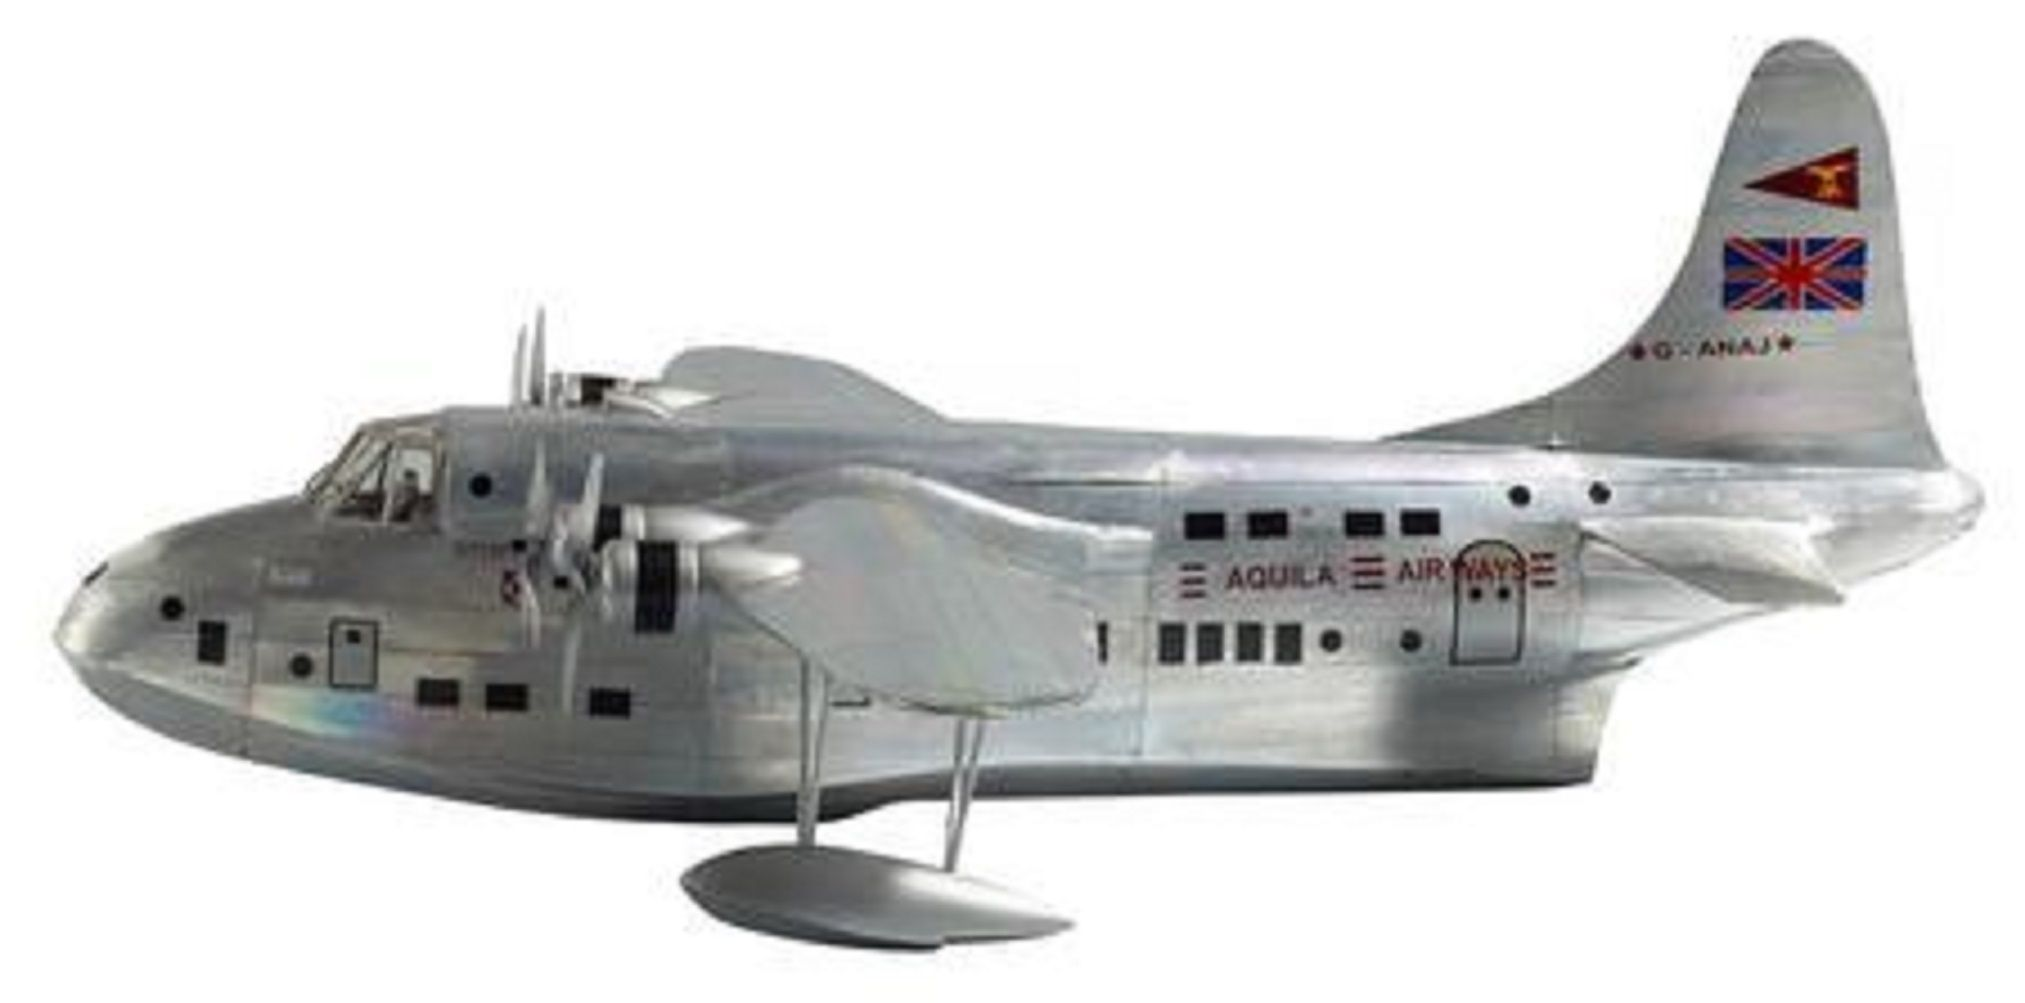 213-6889-Aquila-Airways-Model-Plane-Premier-Range